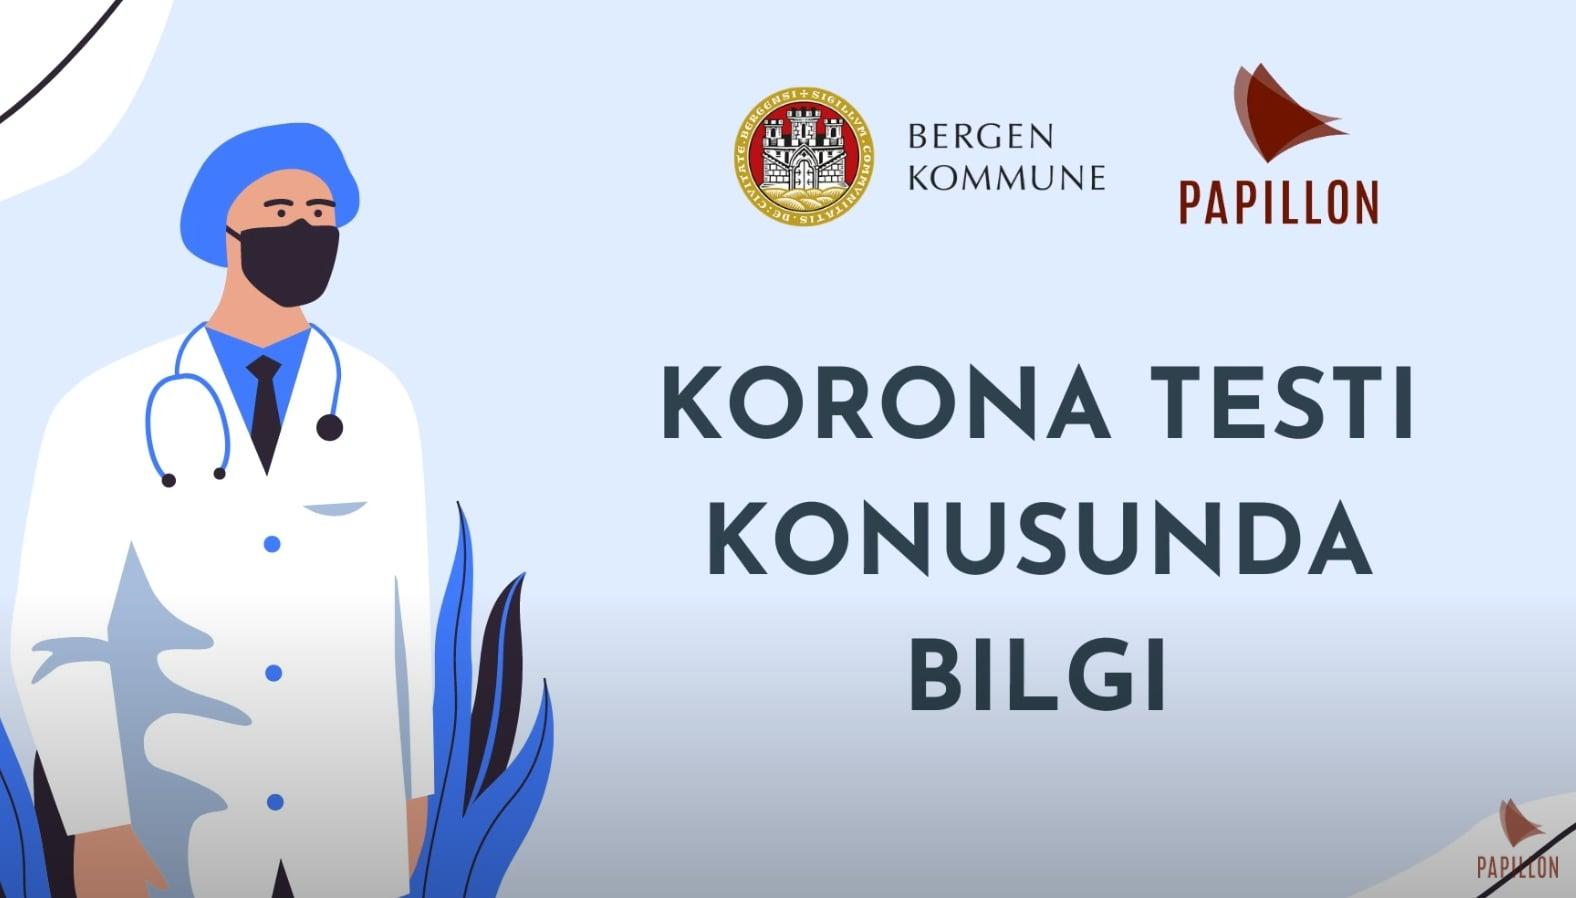 Korona testi konusunda bilgi (COVID-19 test - Tyrkisk)